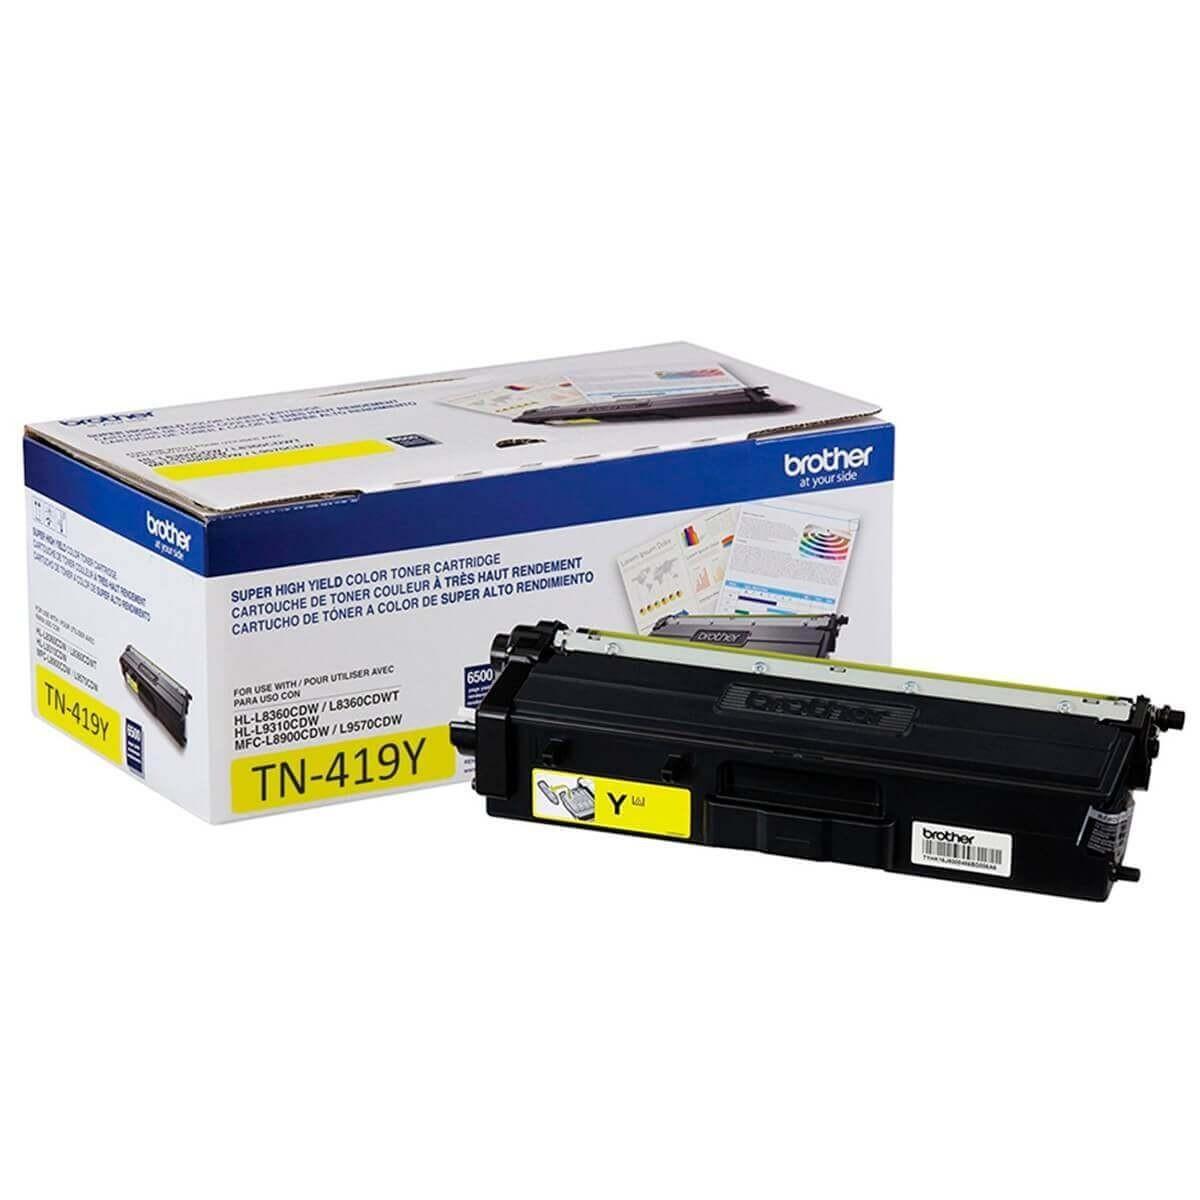 Toner Original Brother Tn419y Tn-419y Yellow Tn419 L8360 L8610 L8900 L9570 9k